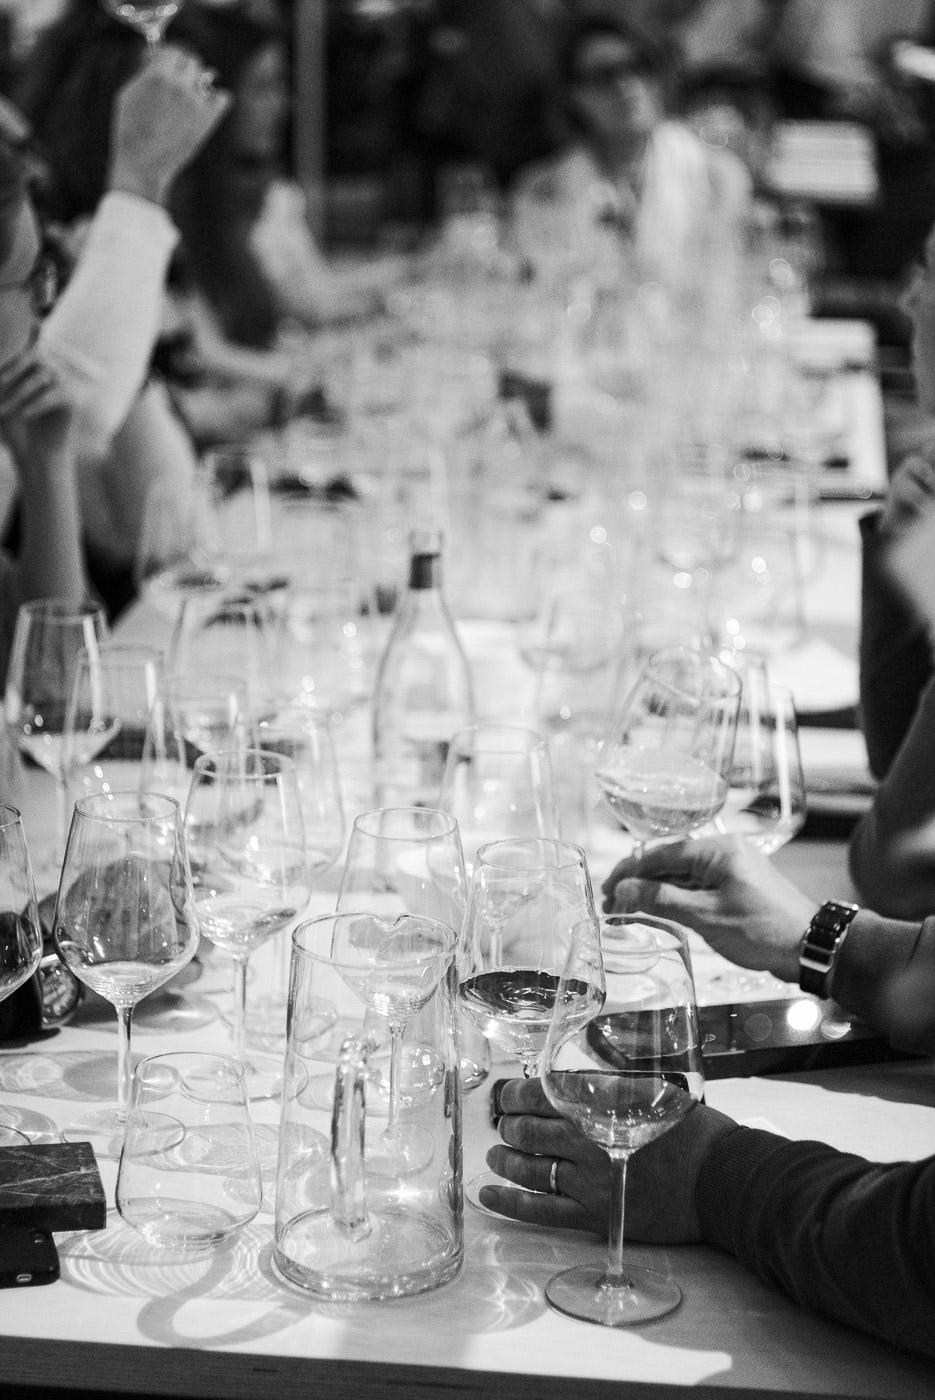 022-Degustazione-Elementary-vino-naturale-_XPR3860_p_LR_web